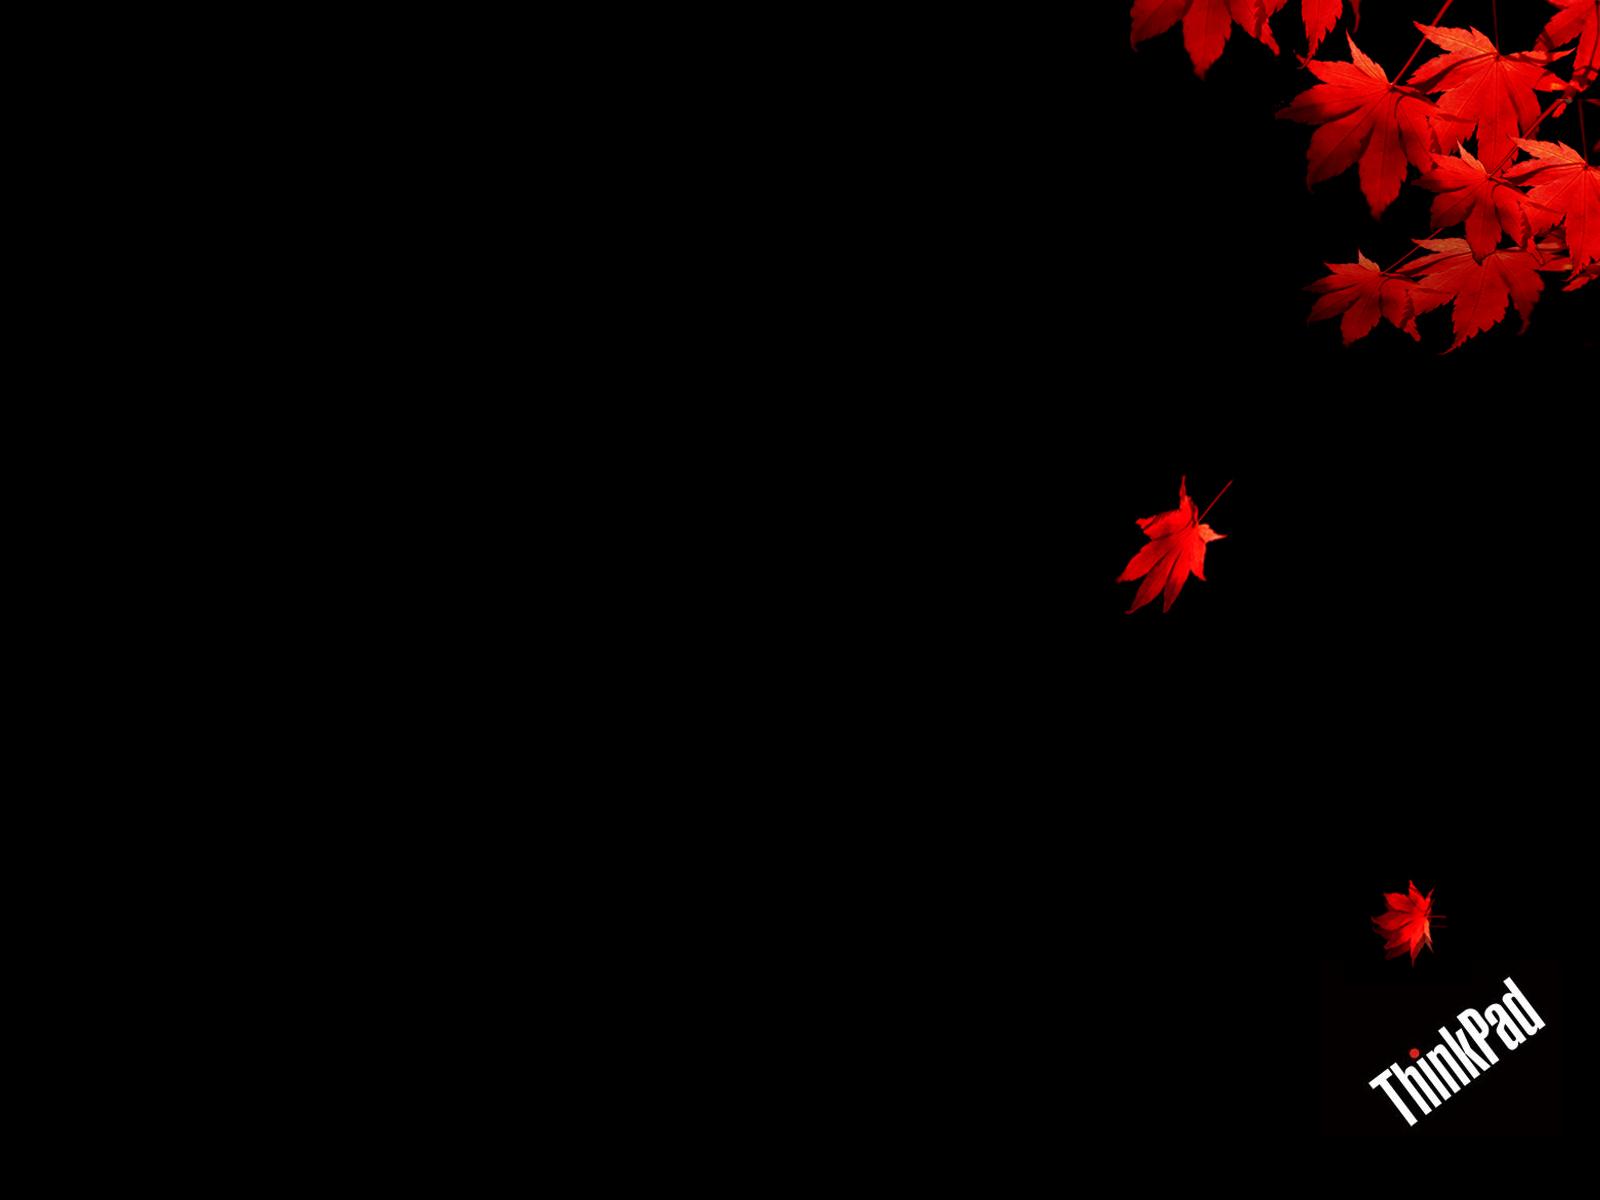 Lenovo Red Wallpaper: Lenovo Thinkpad Wallpapers - Wallpaper Cave